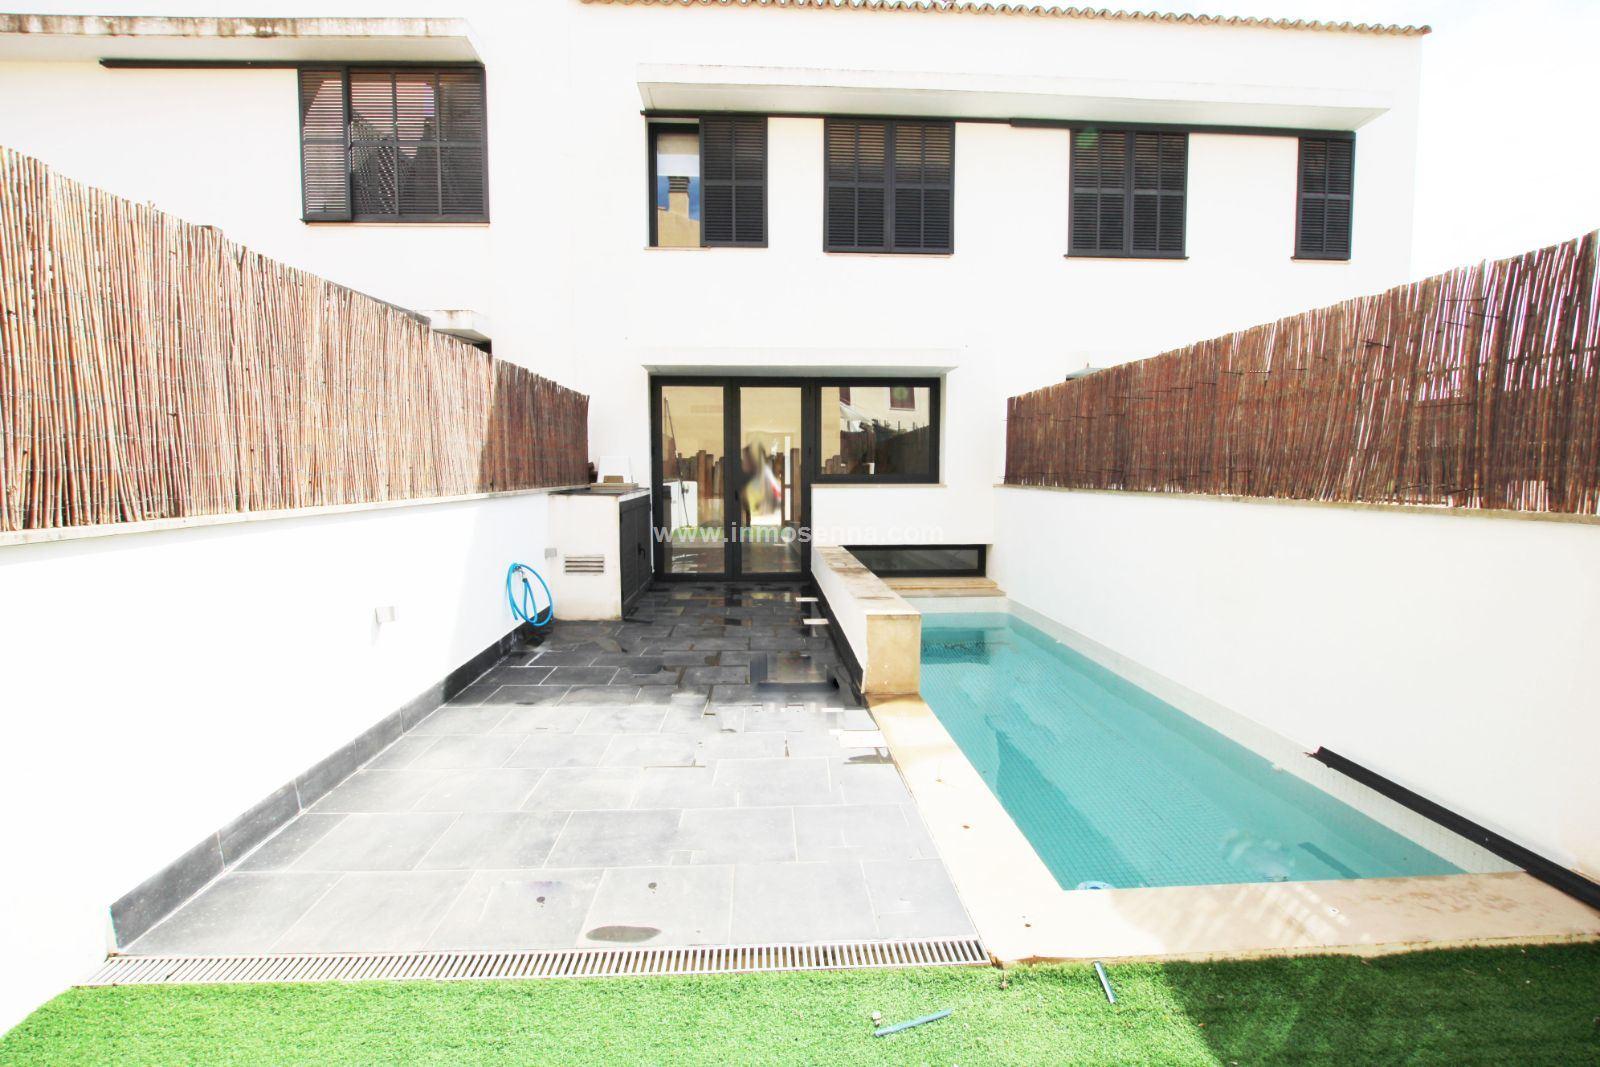 Maison  Marratxi - pont d´inca. Fantástico adosado con terraza y piscina privada